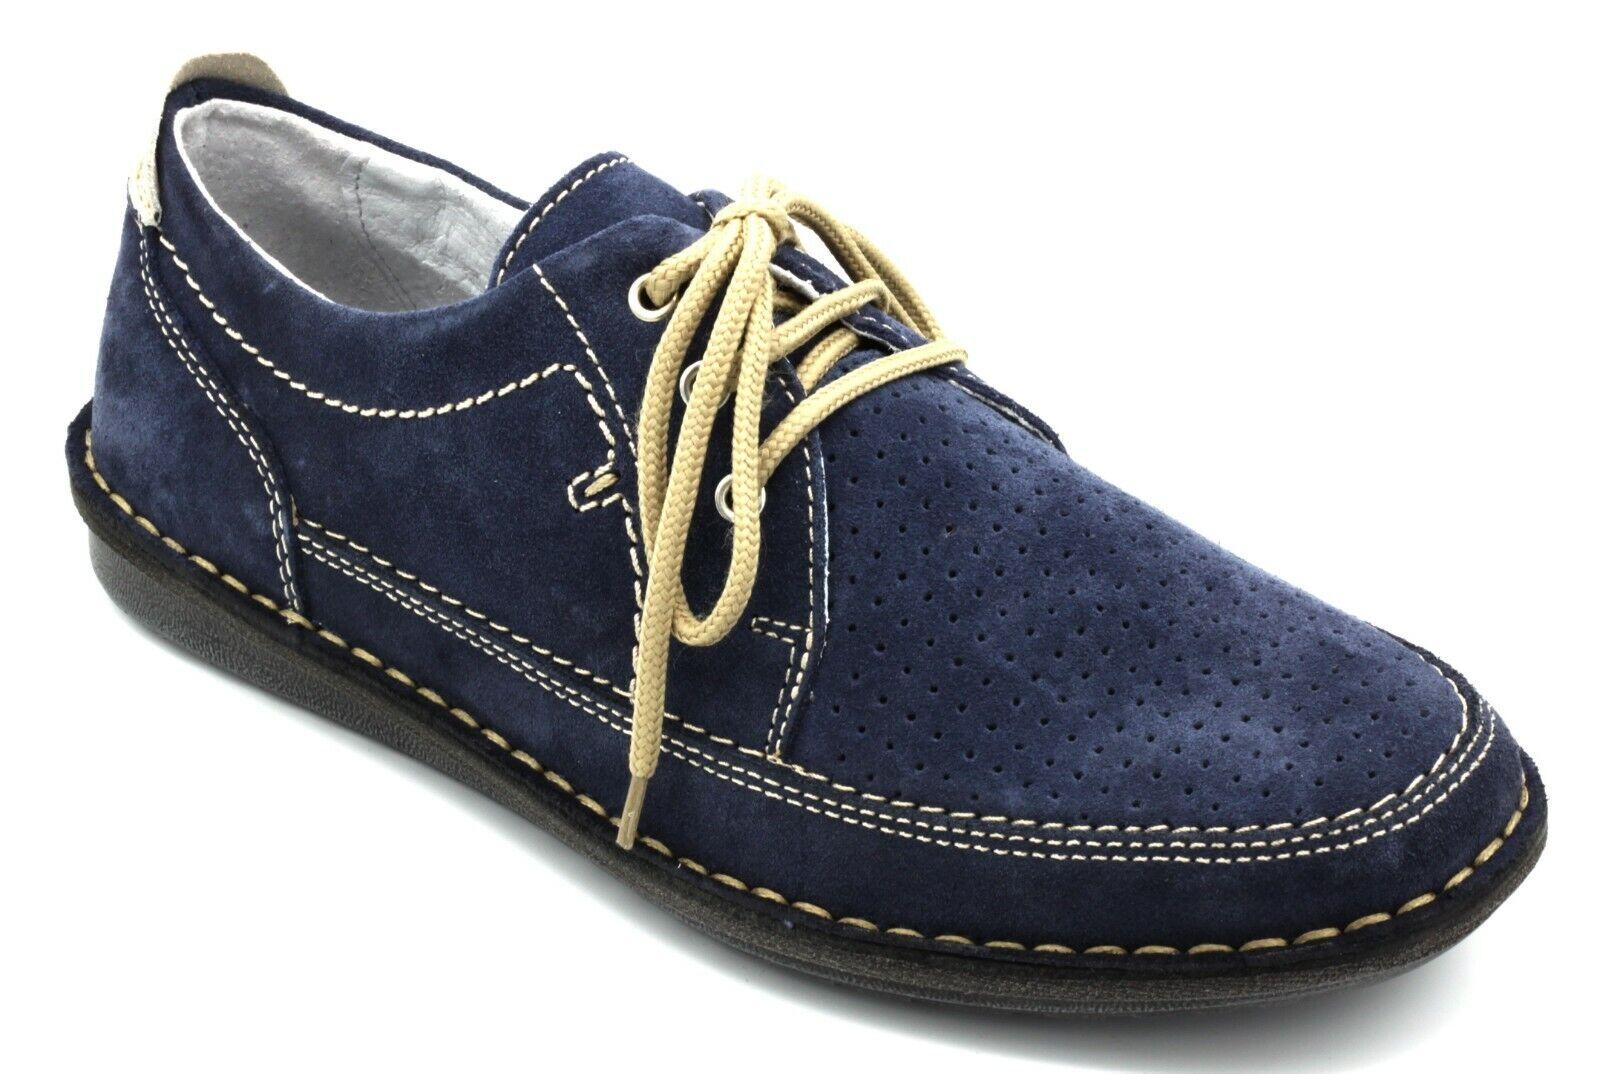 VALLEgreen shoes men ALLACCIATE  IN PELLE NABUK color blue MODA CASUAL n. 45